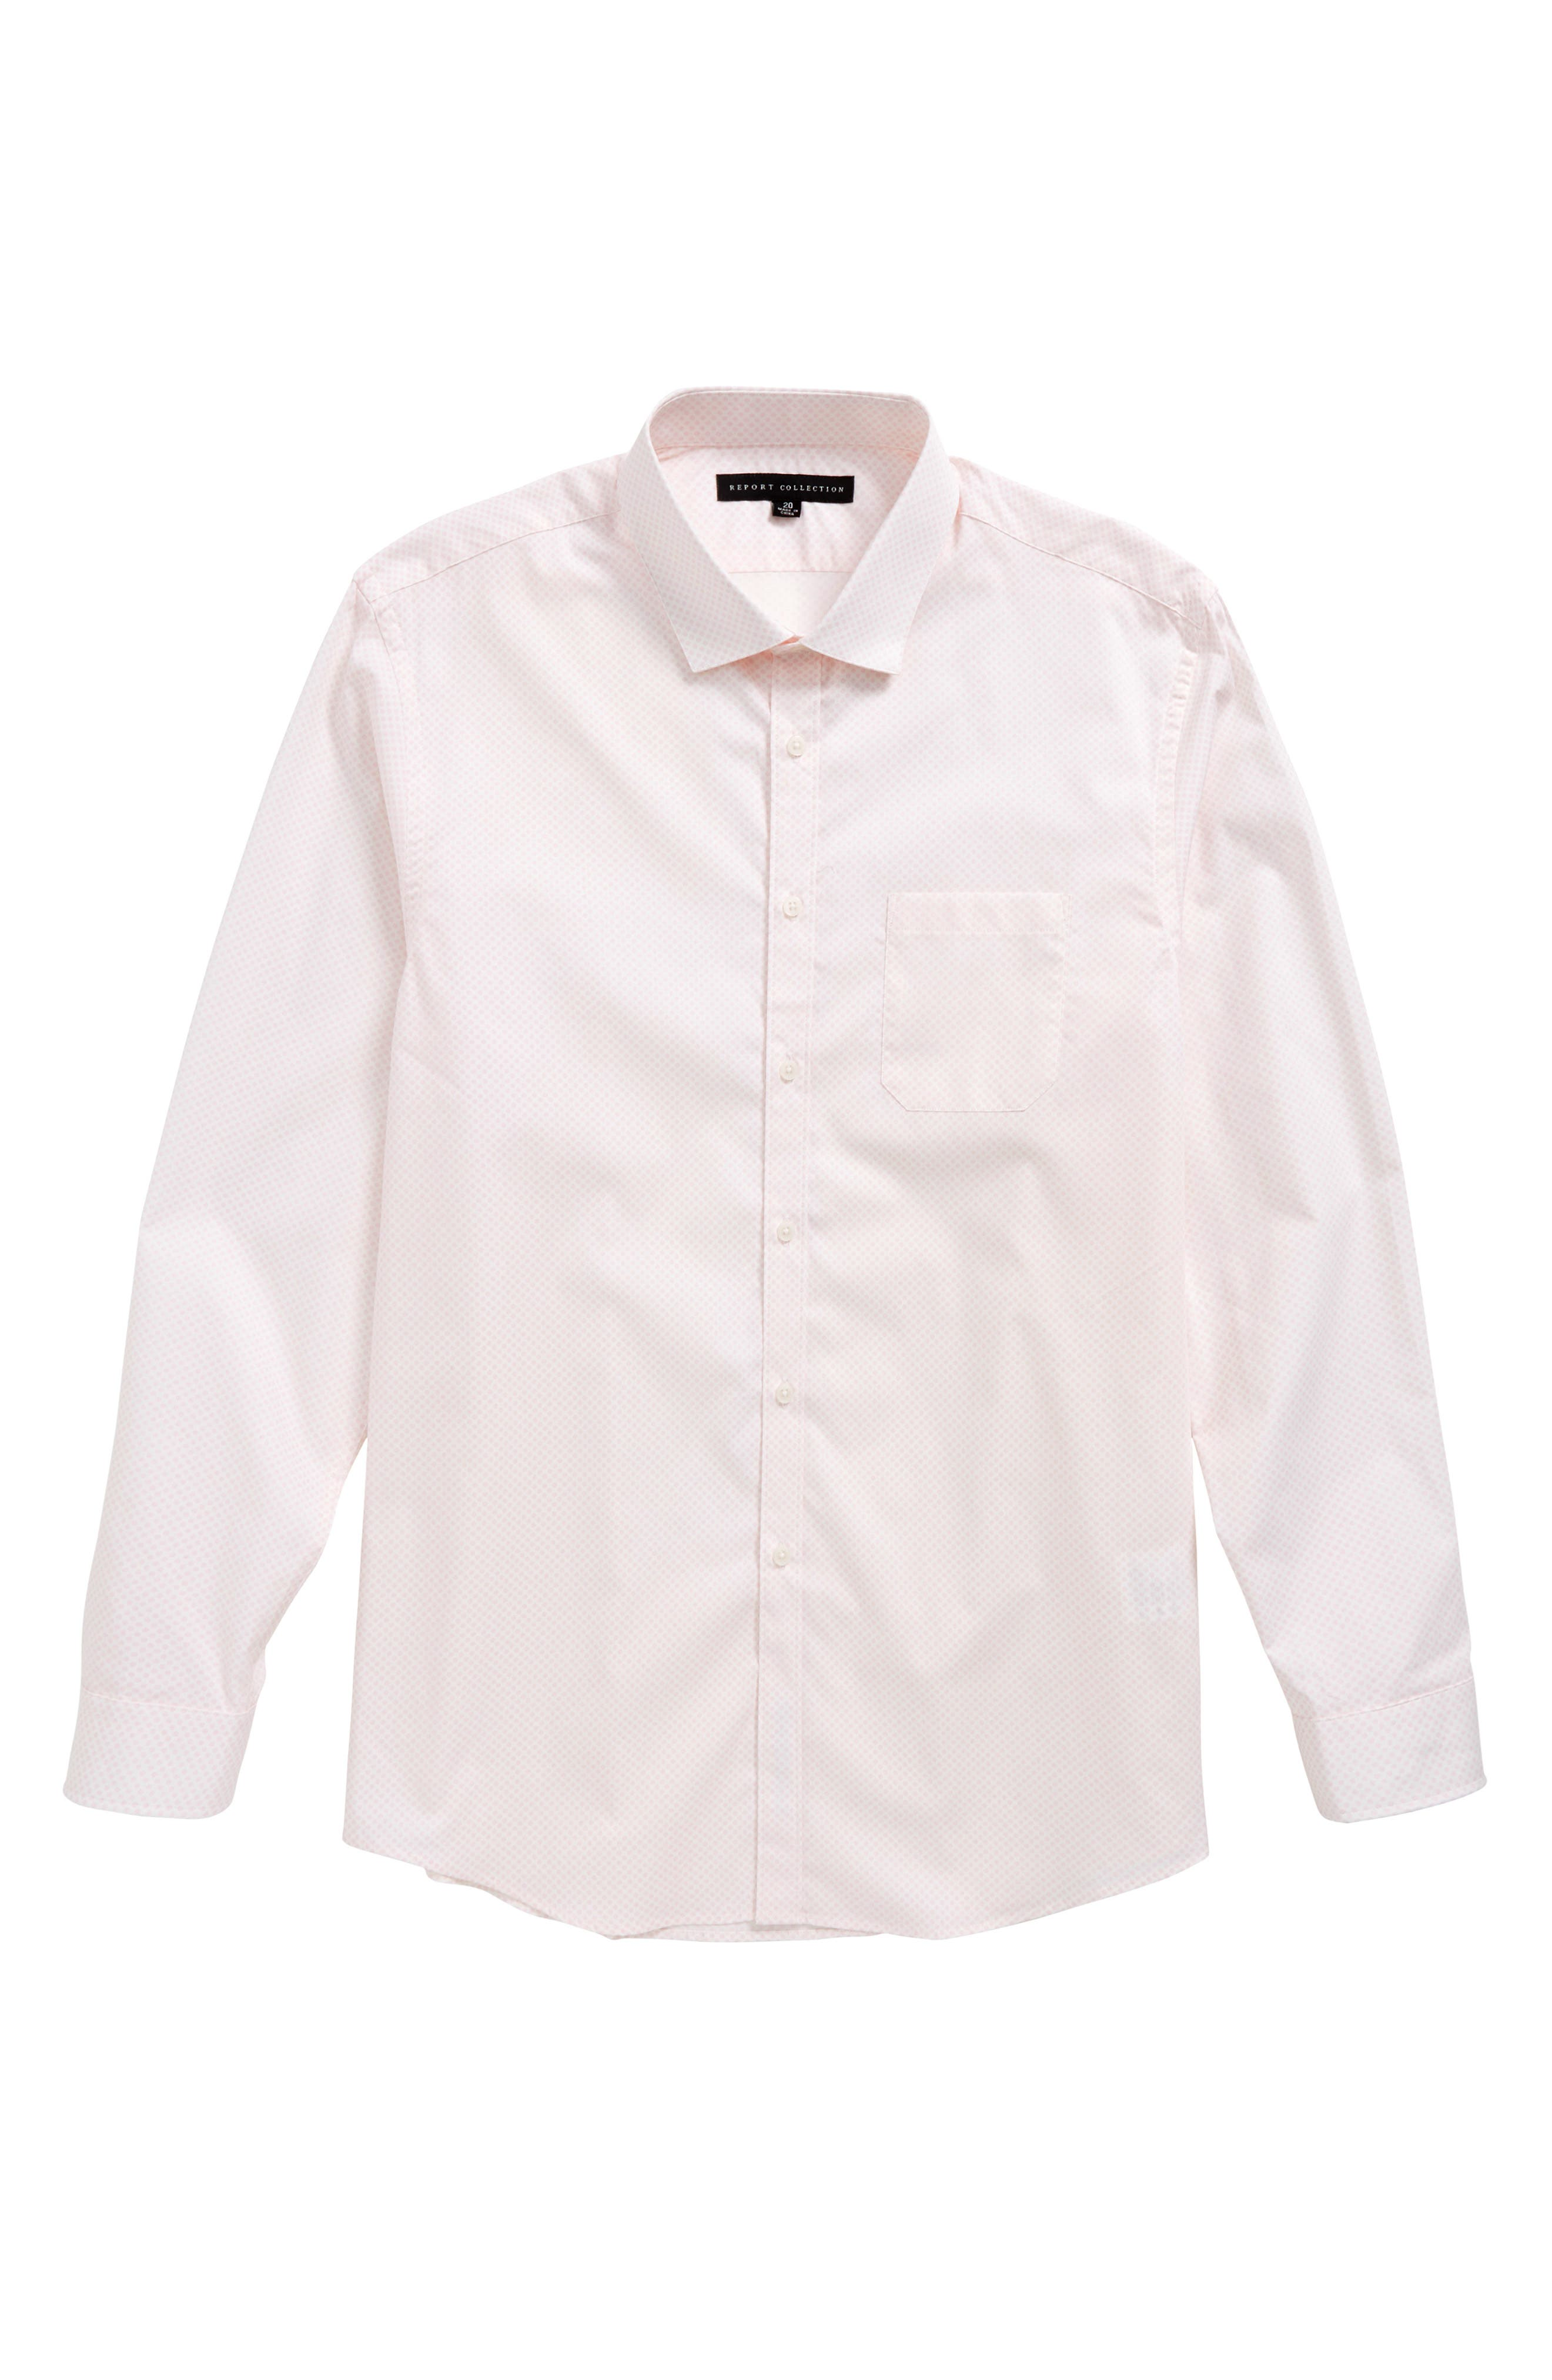 Main Image - Report Collection Dot Print Dress Shirt (Big Boys)